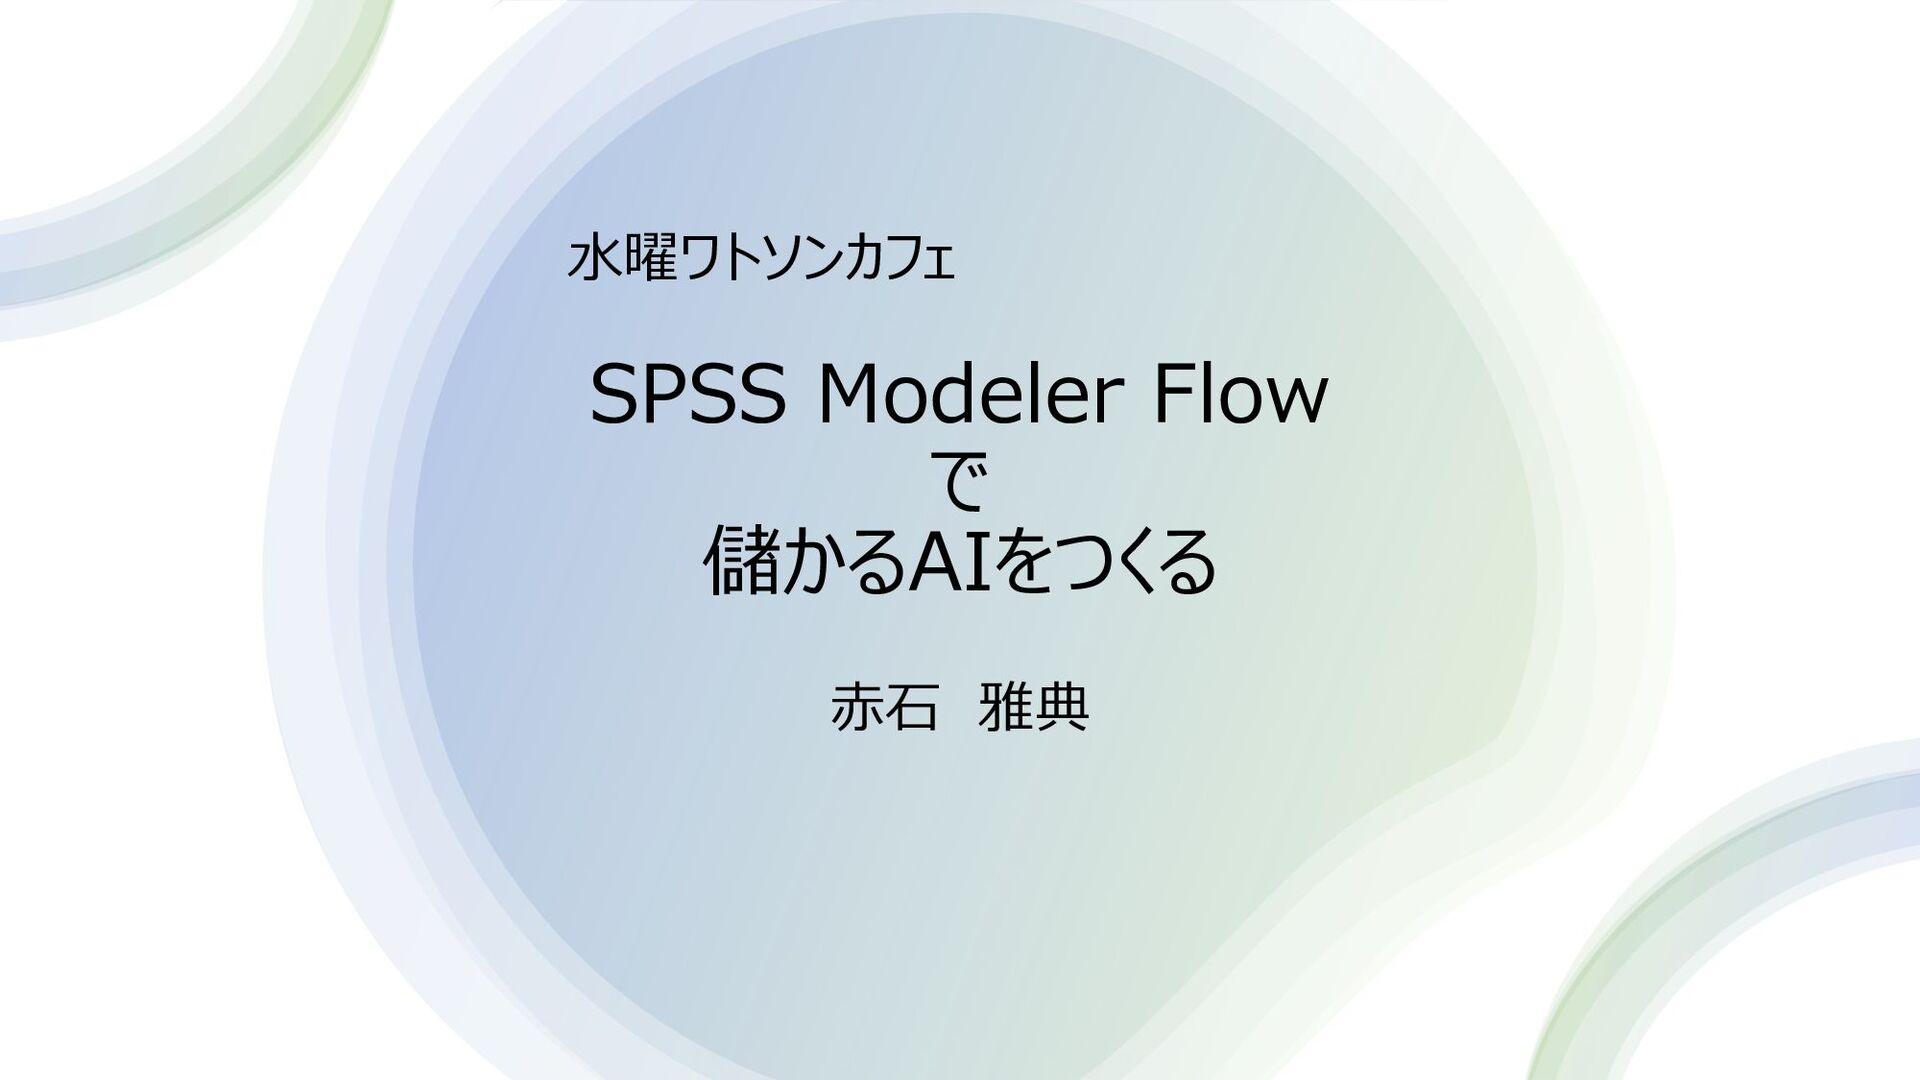 SPSS Modeler Flow で 儲かるAIをつくる ⽔曜ワトソンカフェ アクセンチュア...